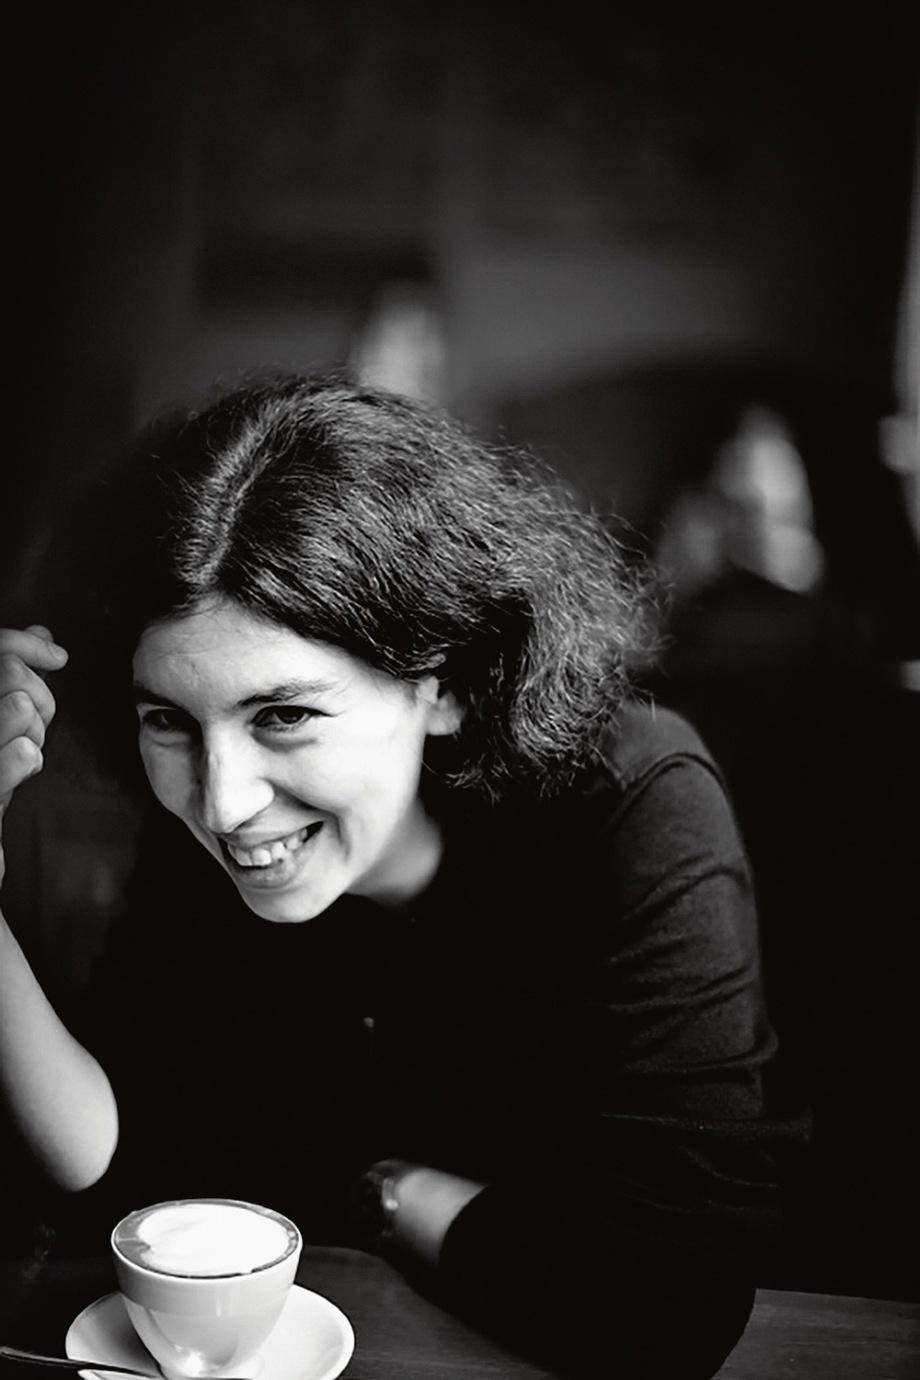 mariam-petrosyan-romanciere-prodige-tardivement-re-connue-ok-isam310430